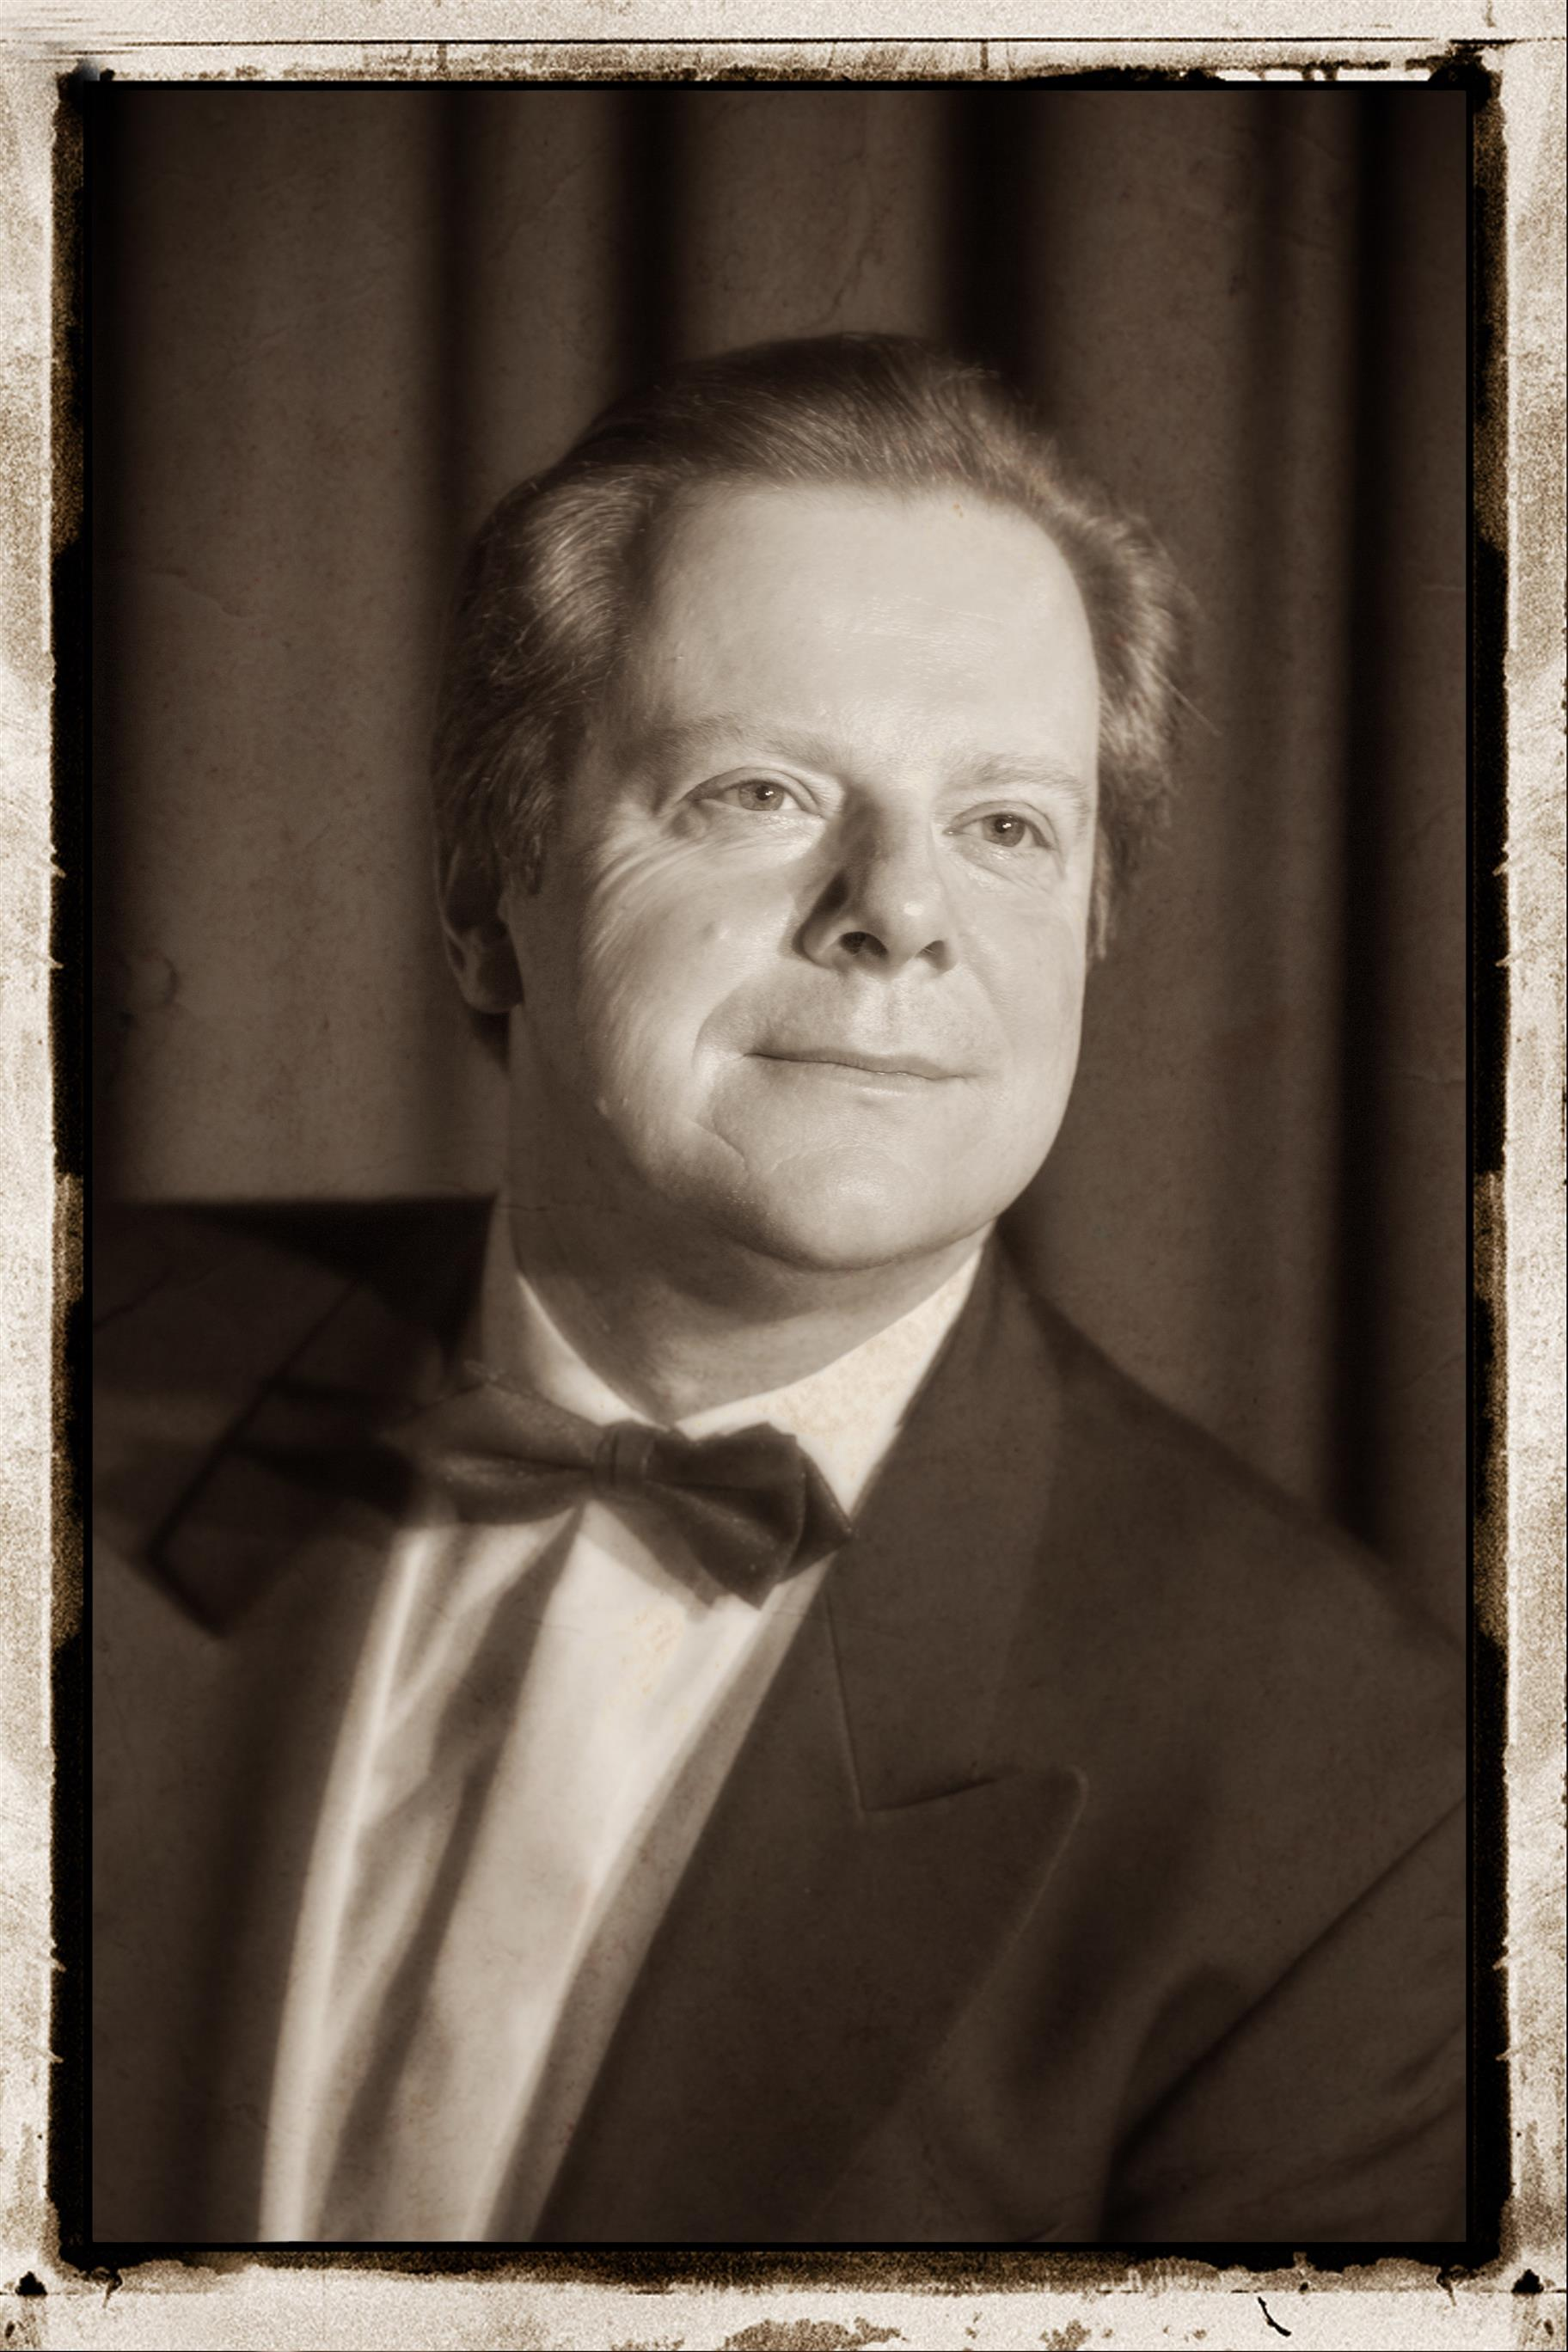 Gerhard Harlander